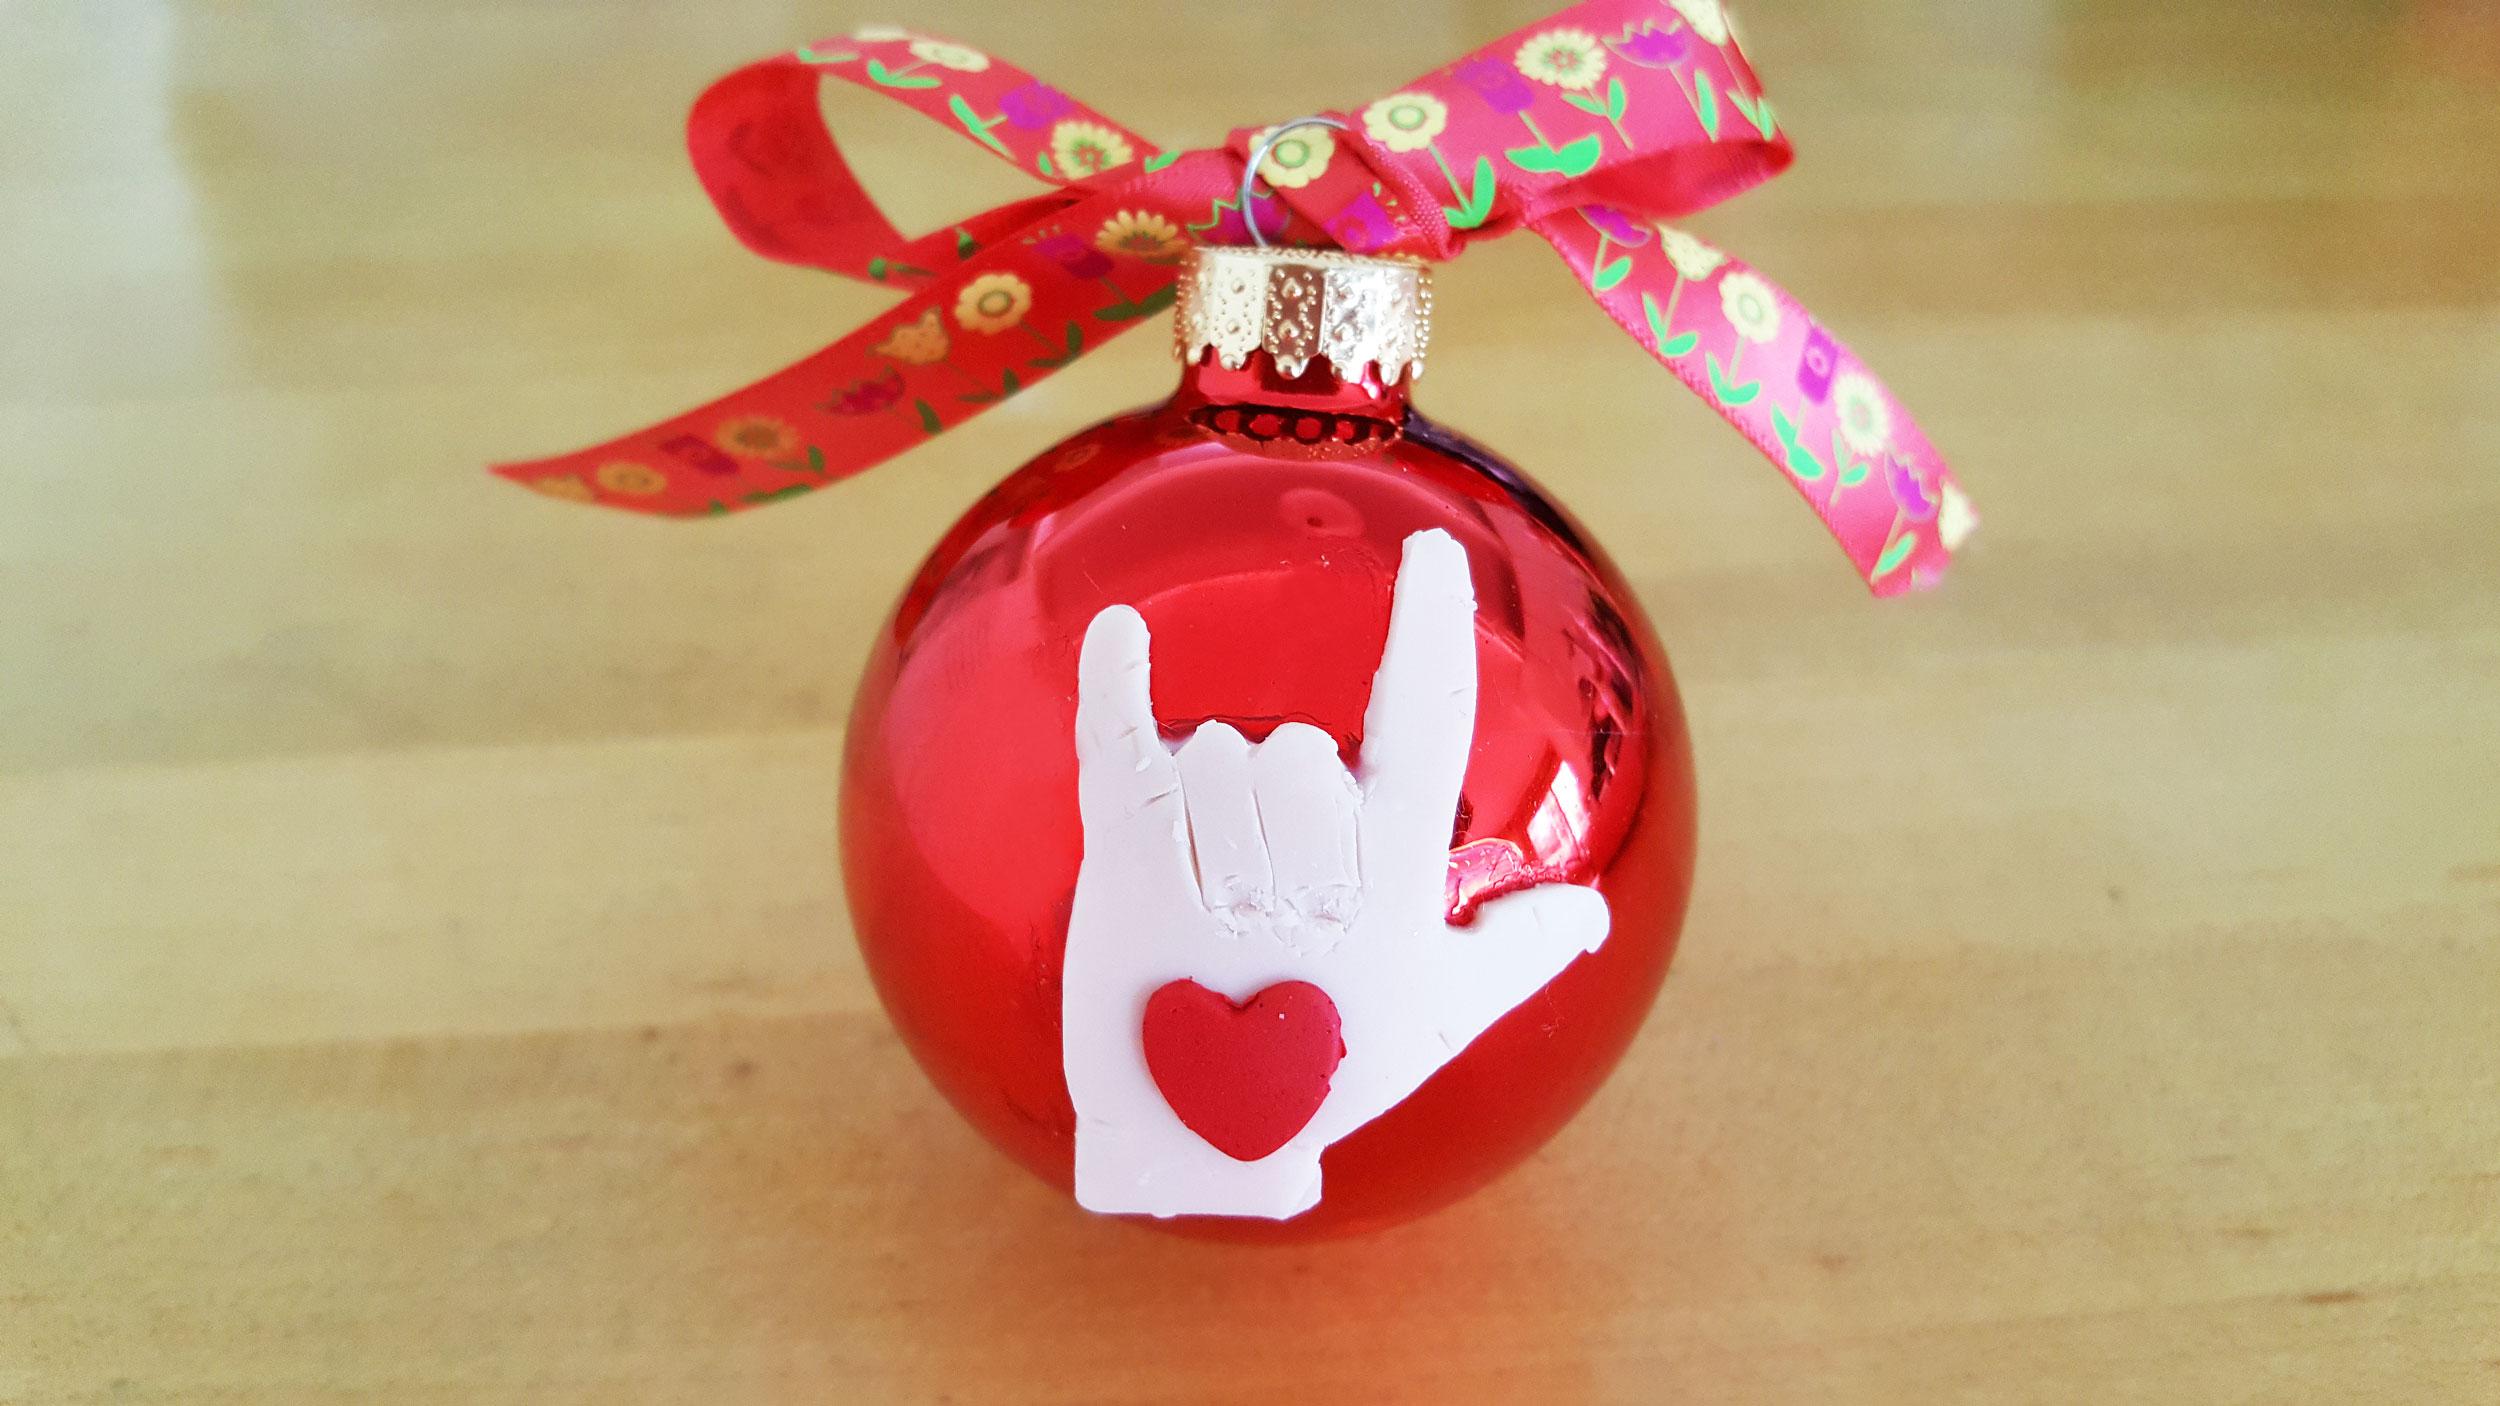 Completed Sign Language Ornament   OrnamentShop.com